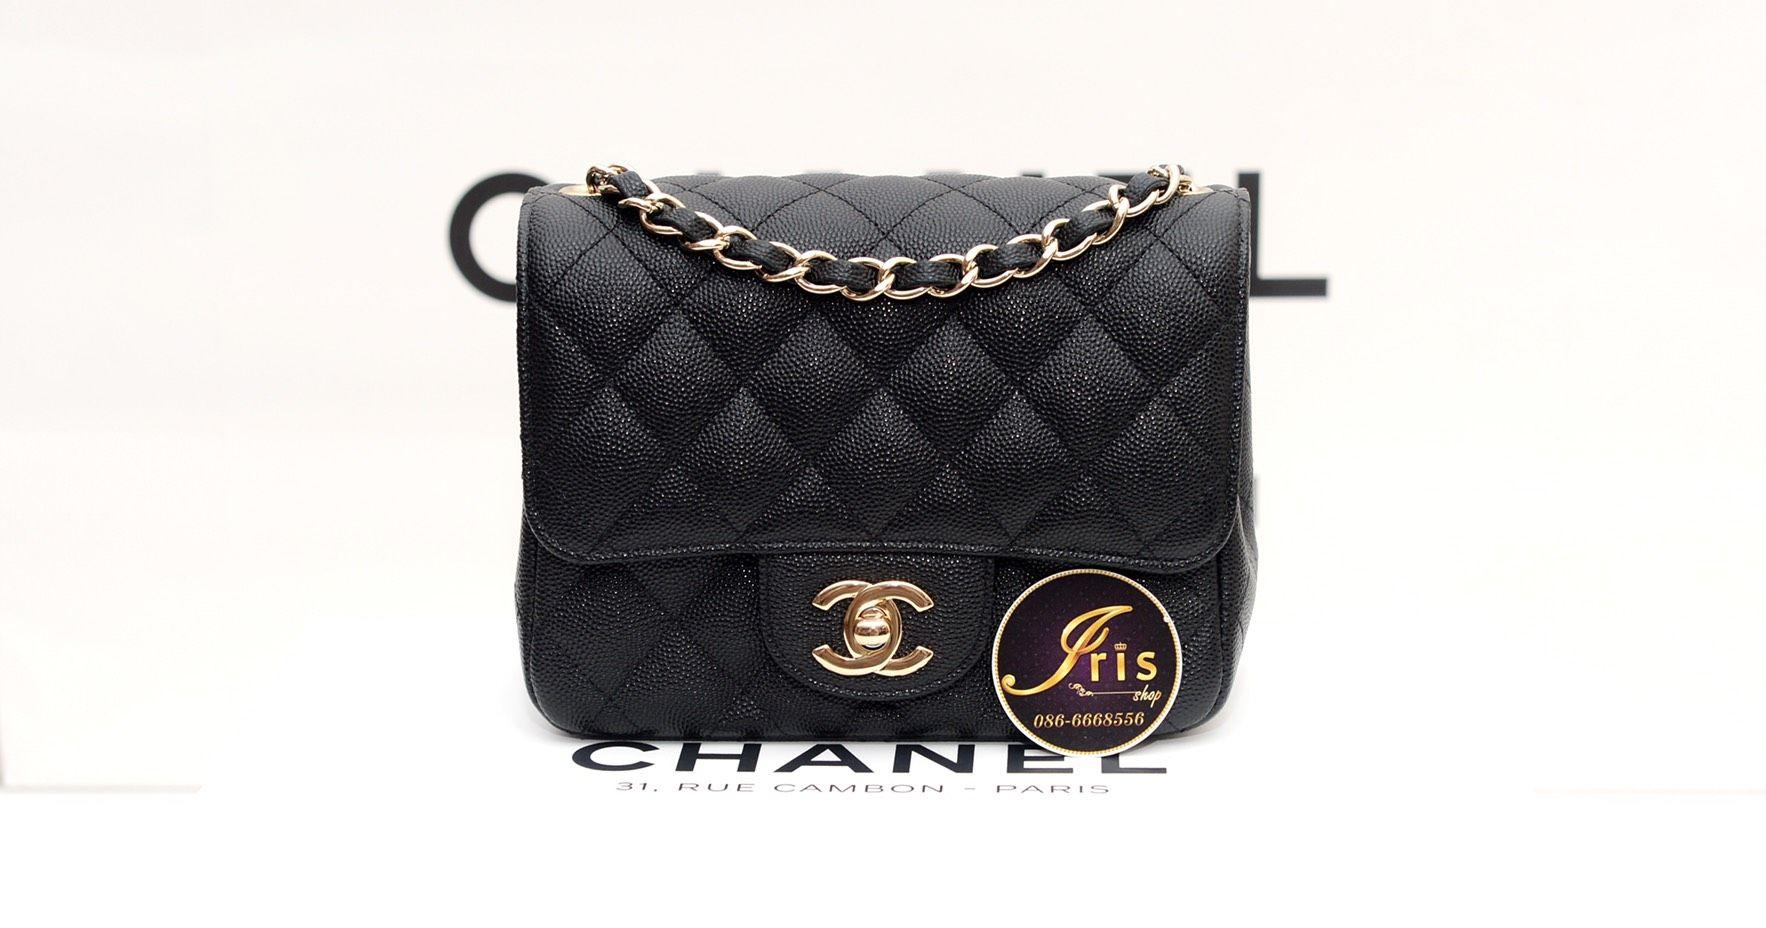 b4d9a552f460  กระเป๋า Chanel Classic Mini 7″ square in Black Caviar GHW เย็บขอบ อะไหล่